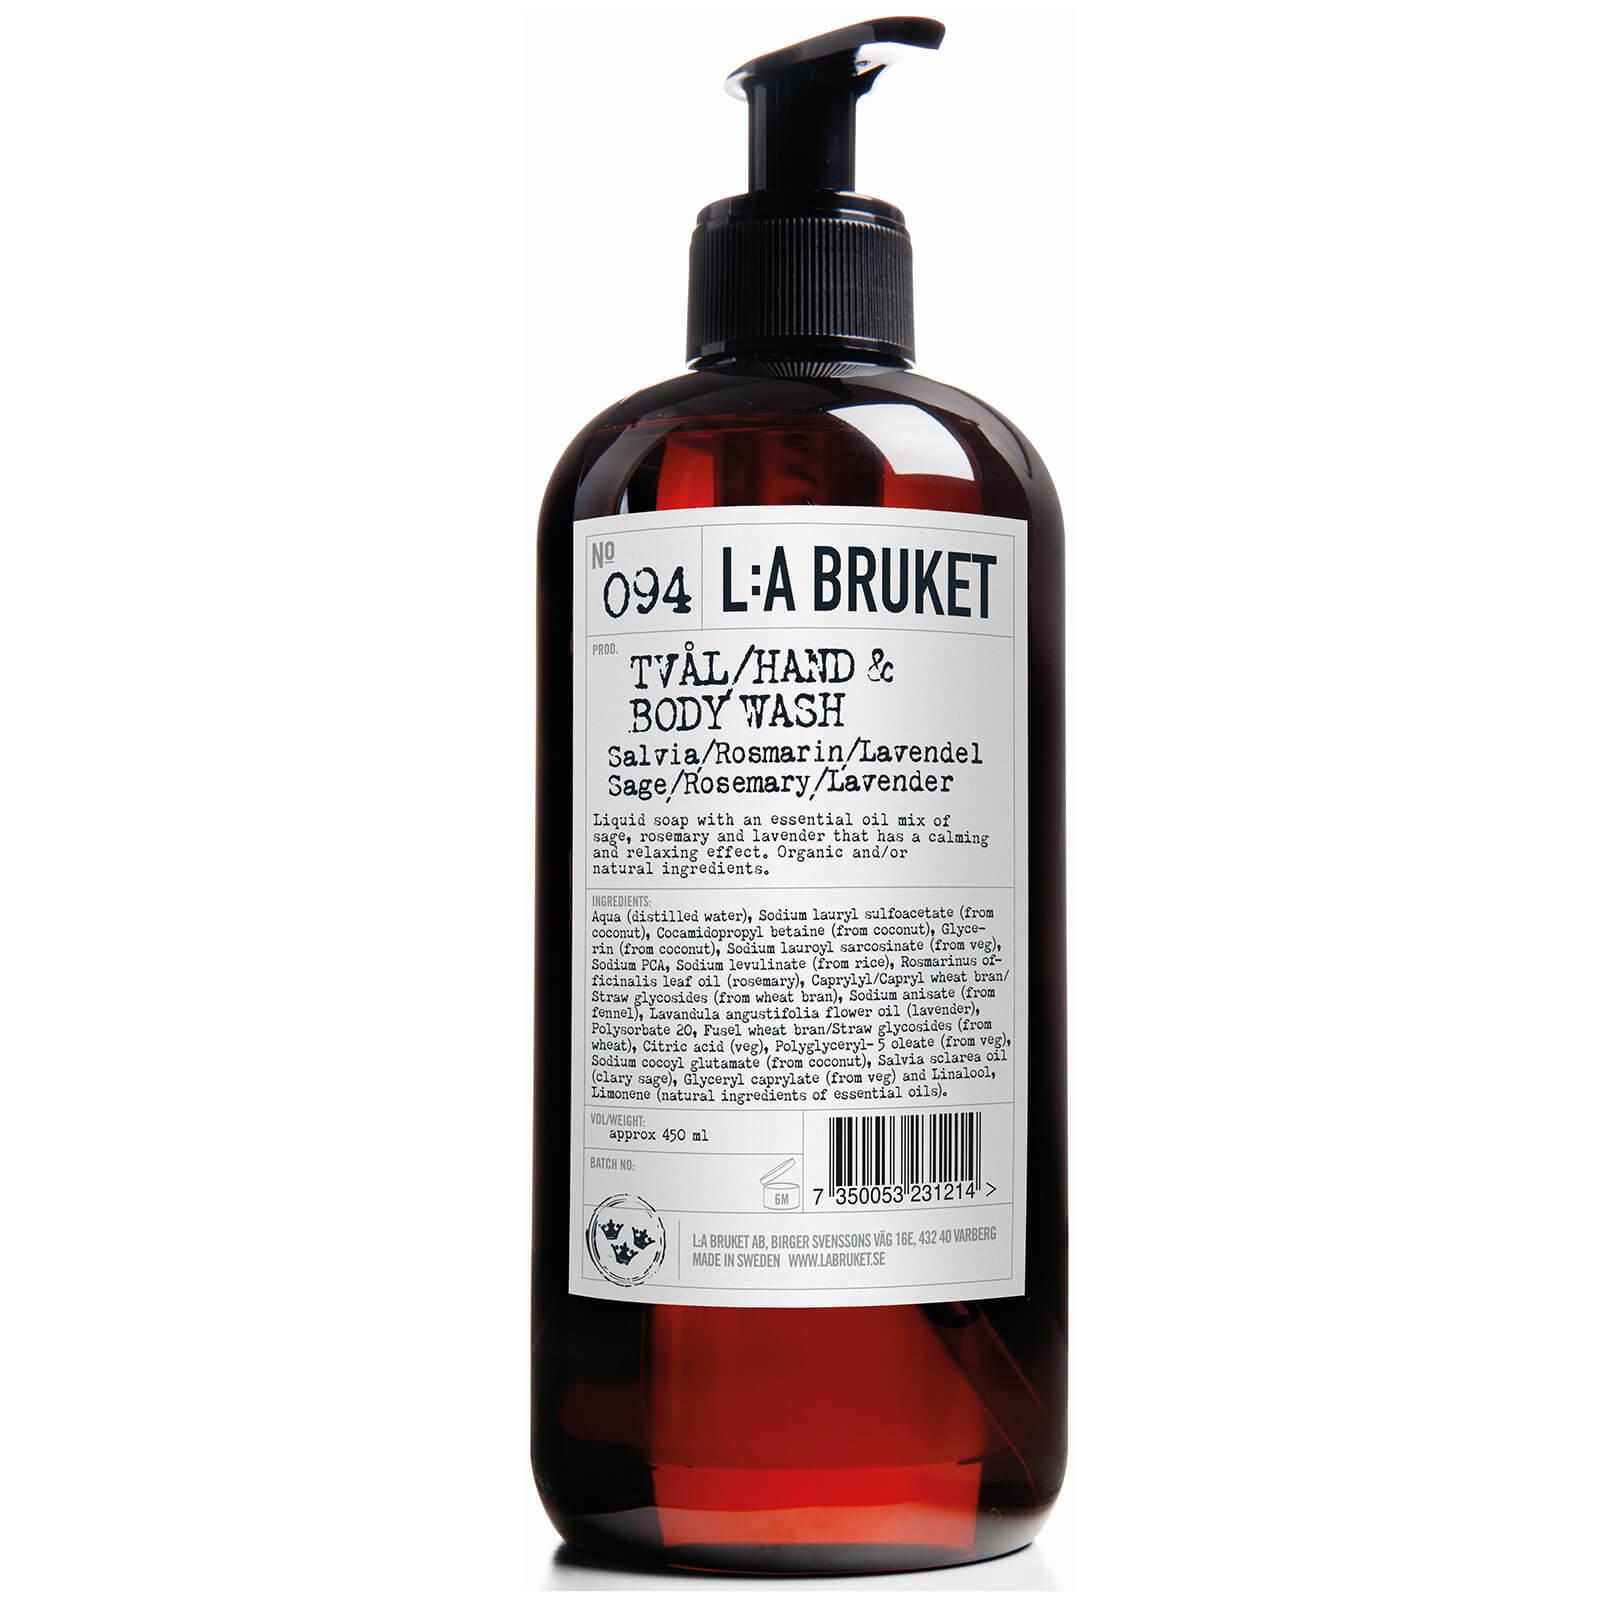 L:A BRUKET No. 094 鼠尾草迷迭香薰衣草 洗手液/沐浴露两用 450ml